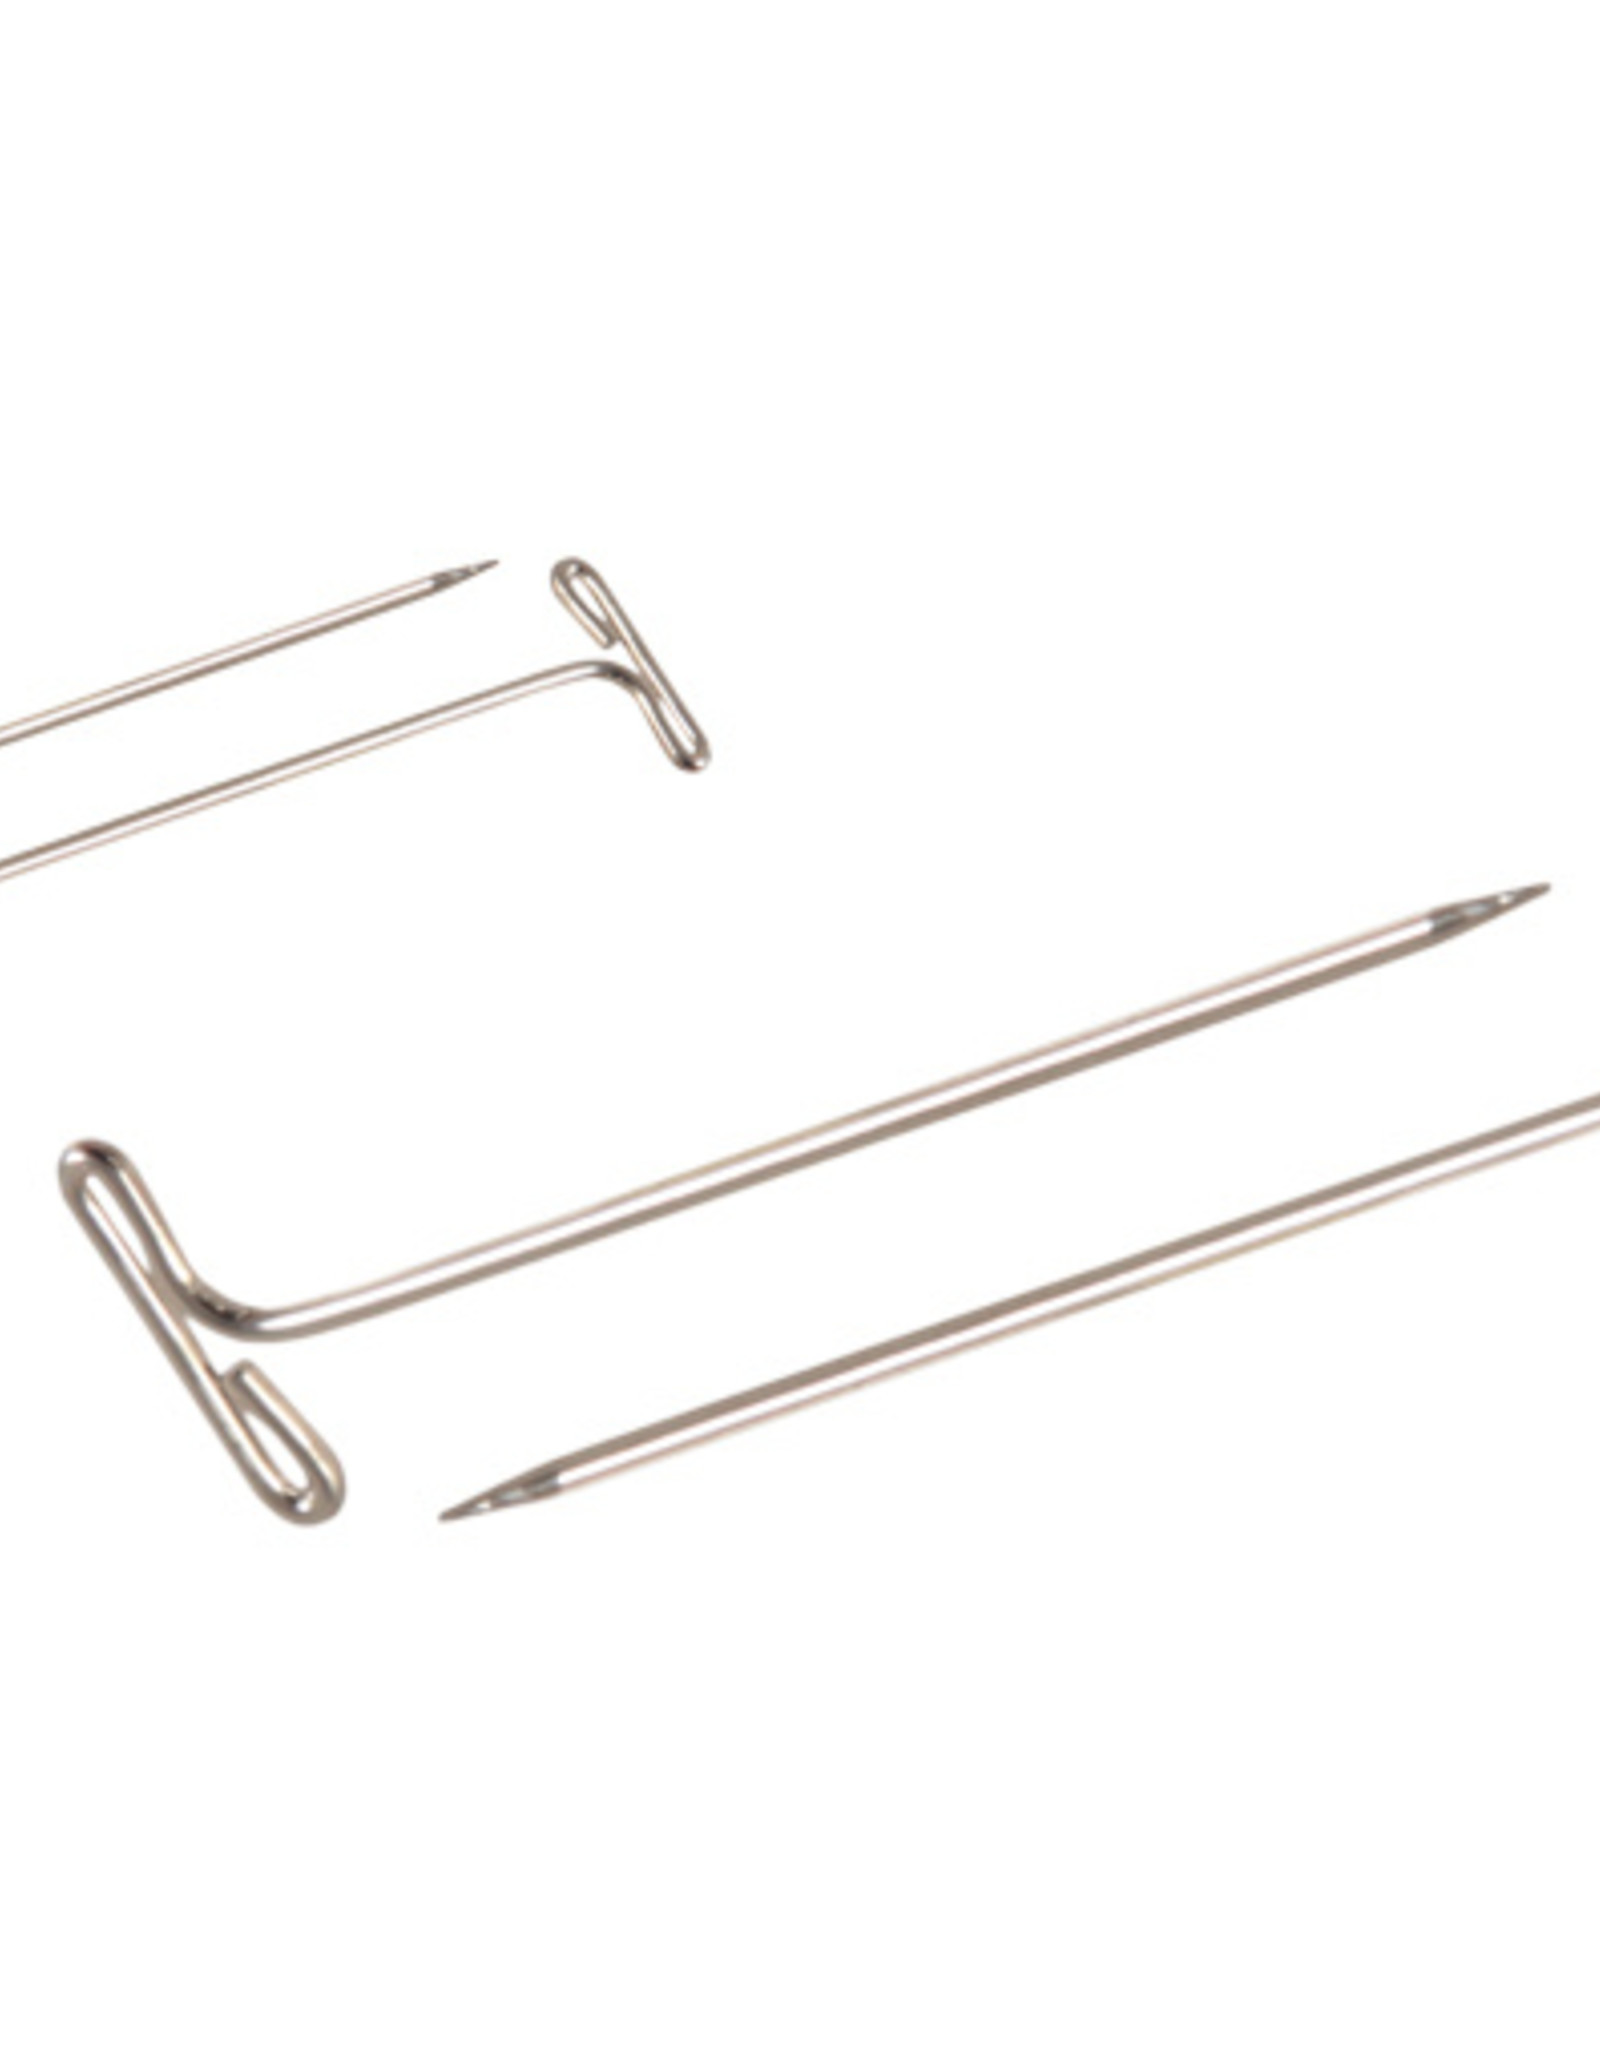 T-pins KP 50ct in case